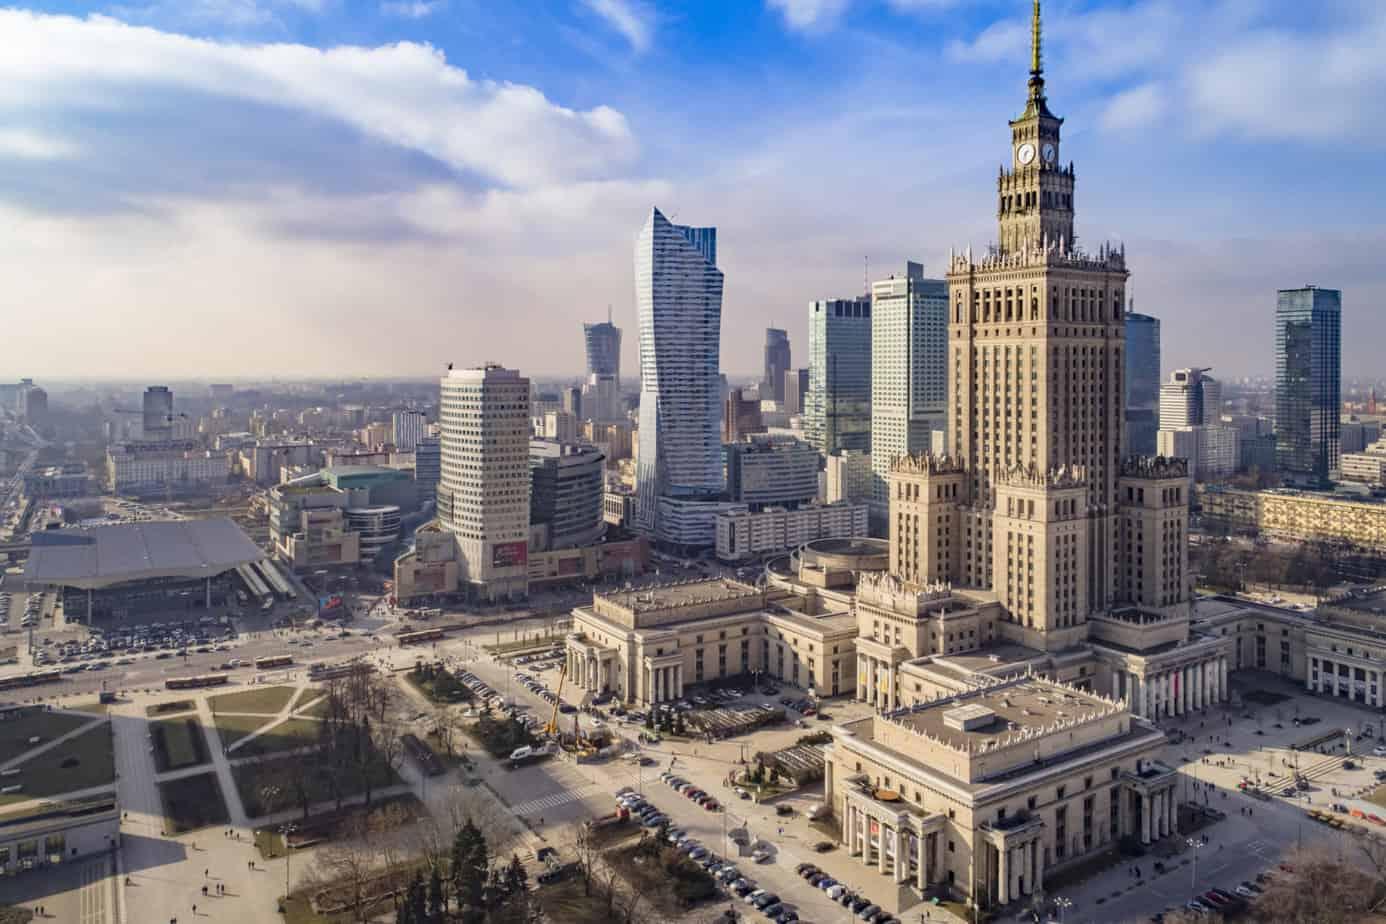 Binnenstad van Warschau, Polen